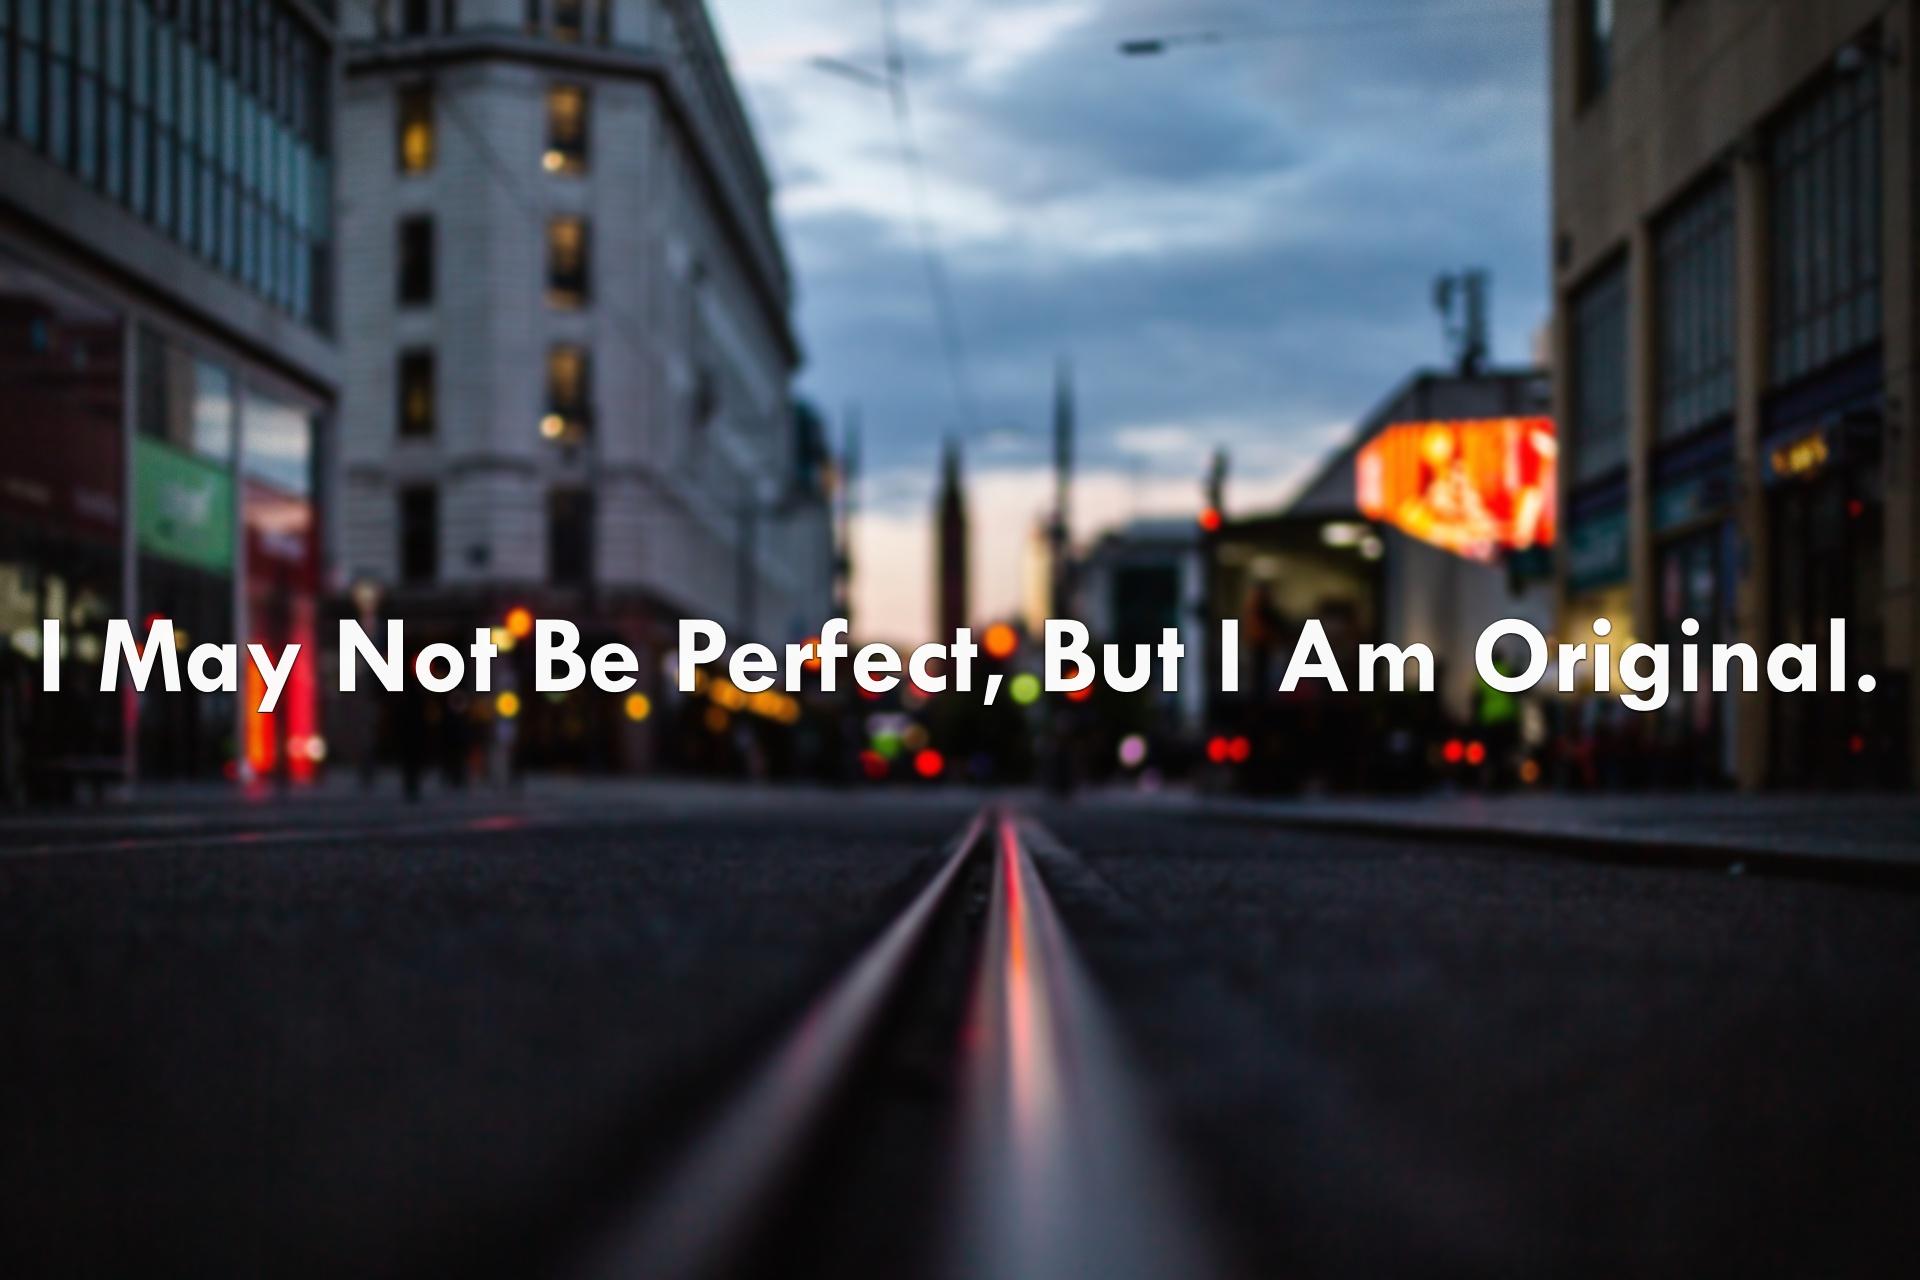 I may not be perfect, but I am original.